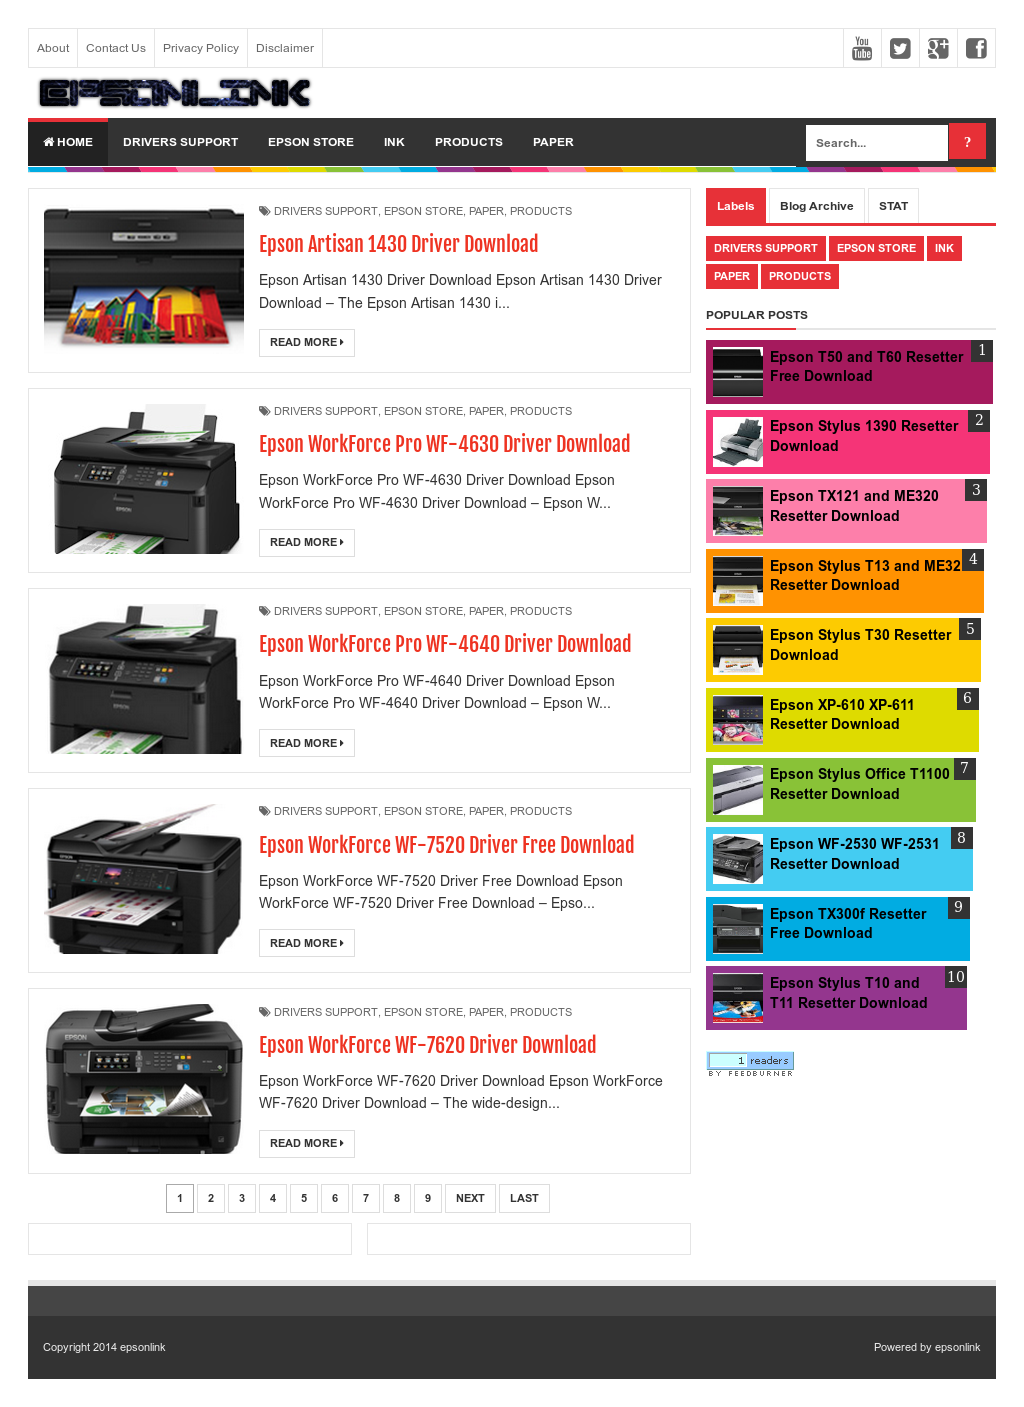 Owler Reports - Epsonlink Blog Epson L1300 Resetter Free